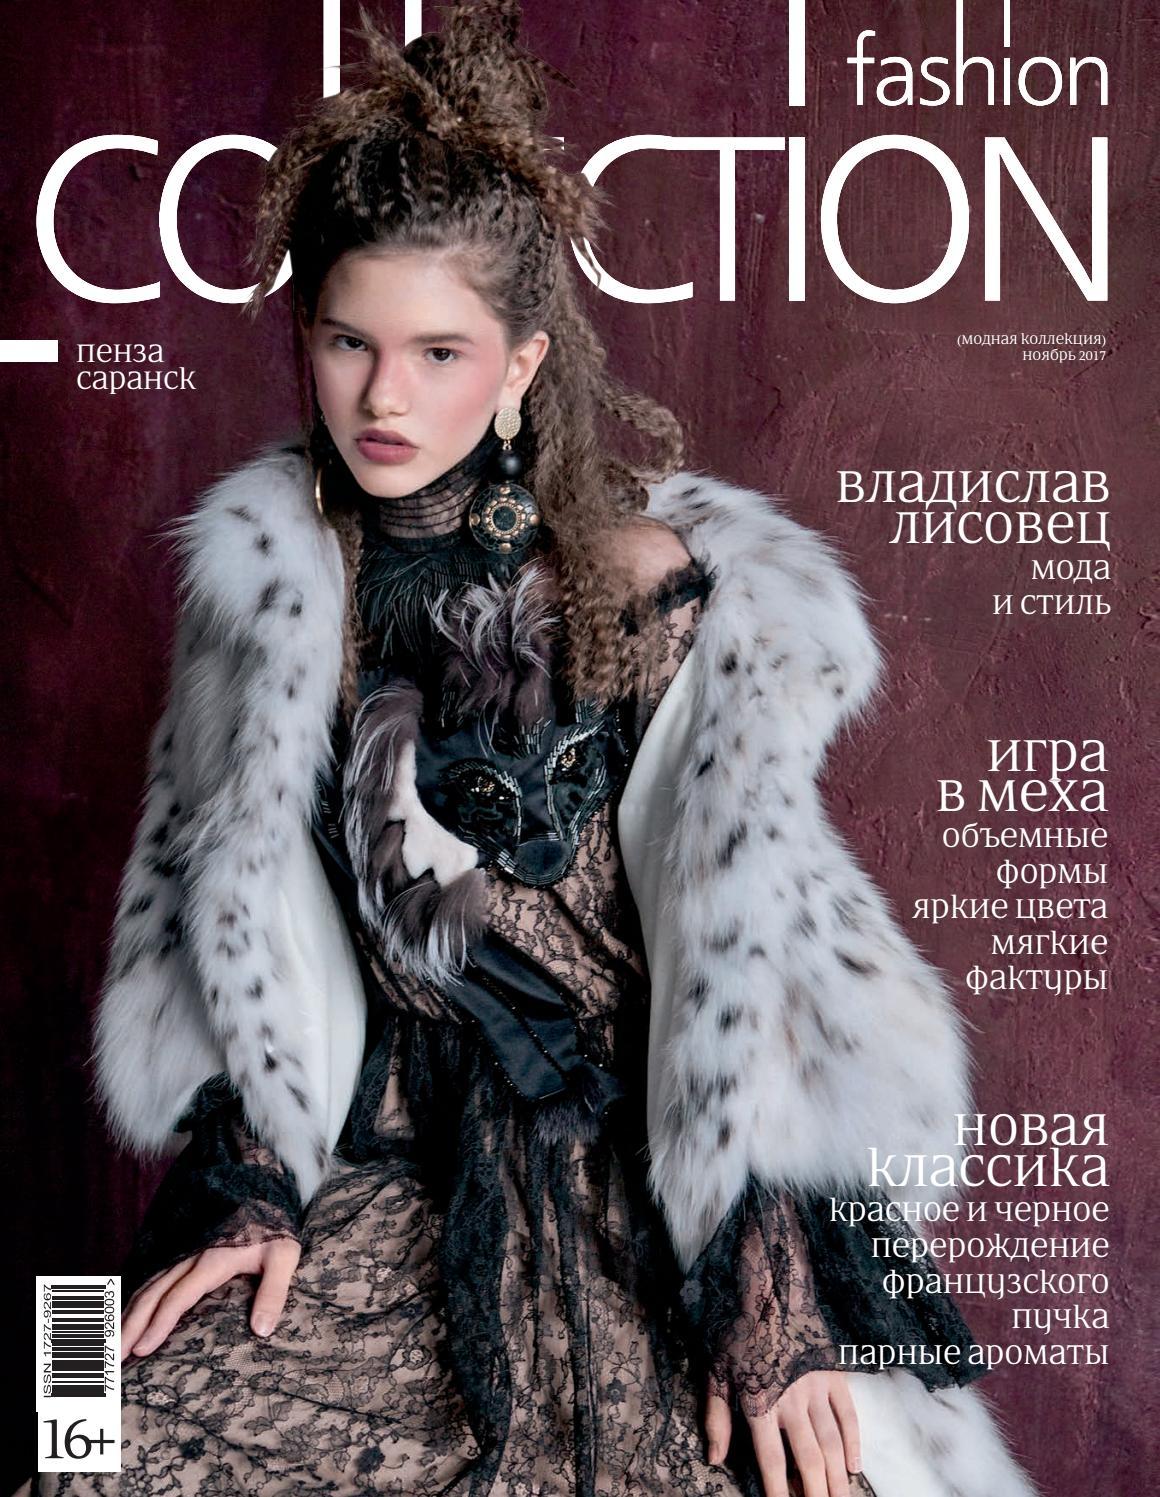 d44914ffa5d Fashion Сollection Penza November 2017 by Fashion Collection Пенза - issuu